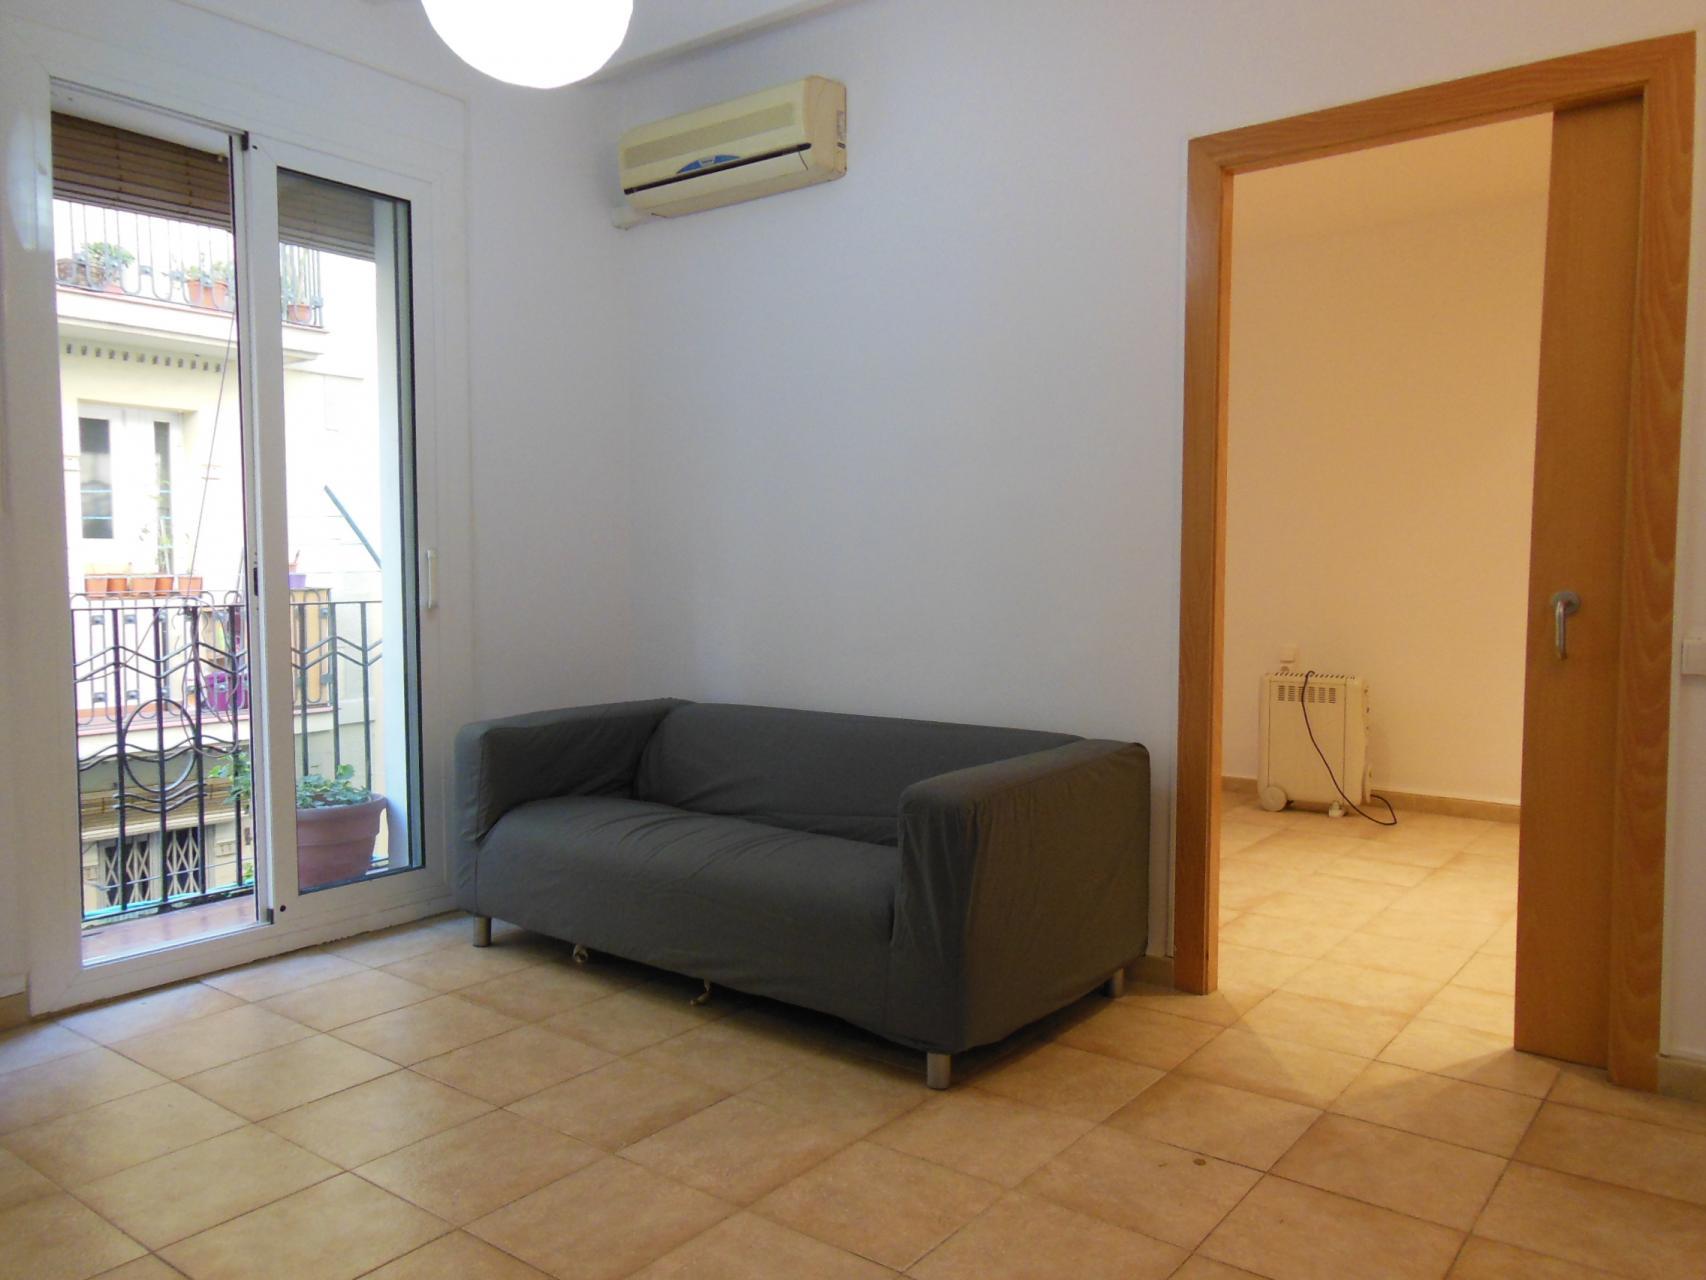 Apartamento en alquiler barcelona ciutat vella sevilla almirall cervera - Apartamentos en alquiler barcelona ...